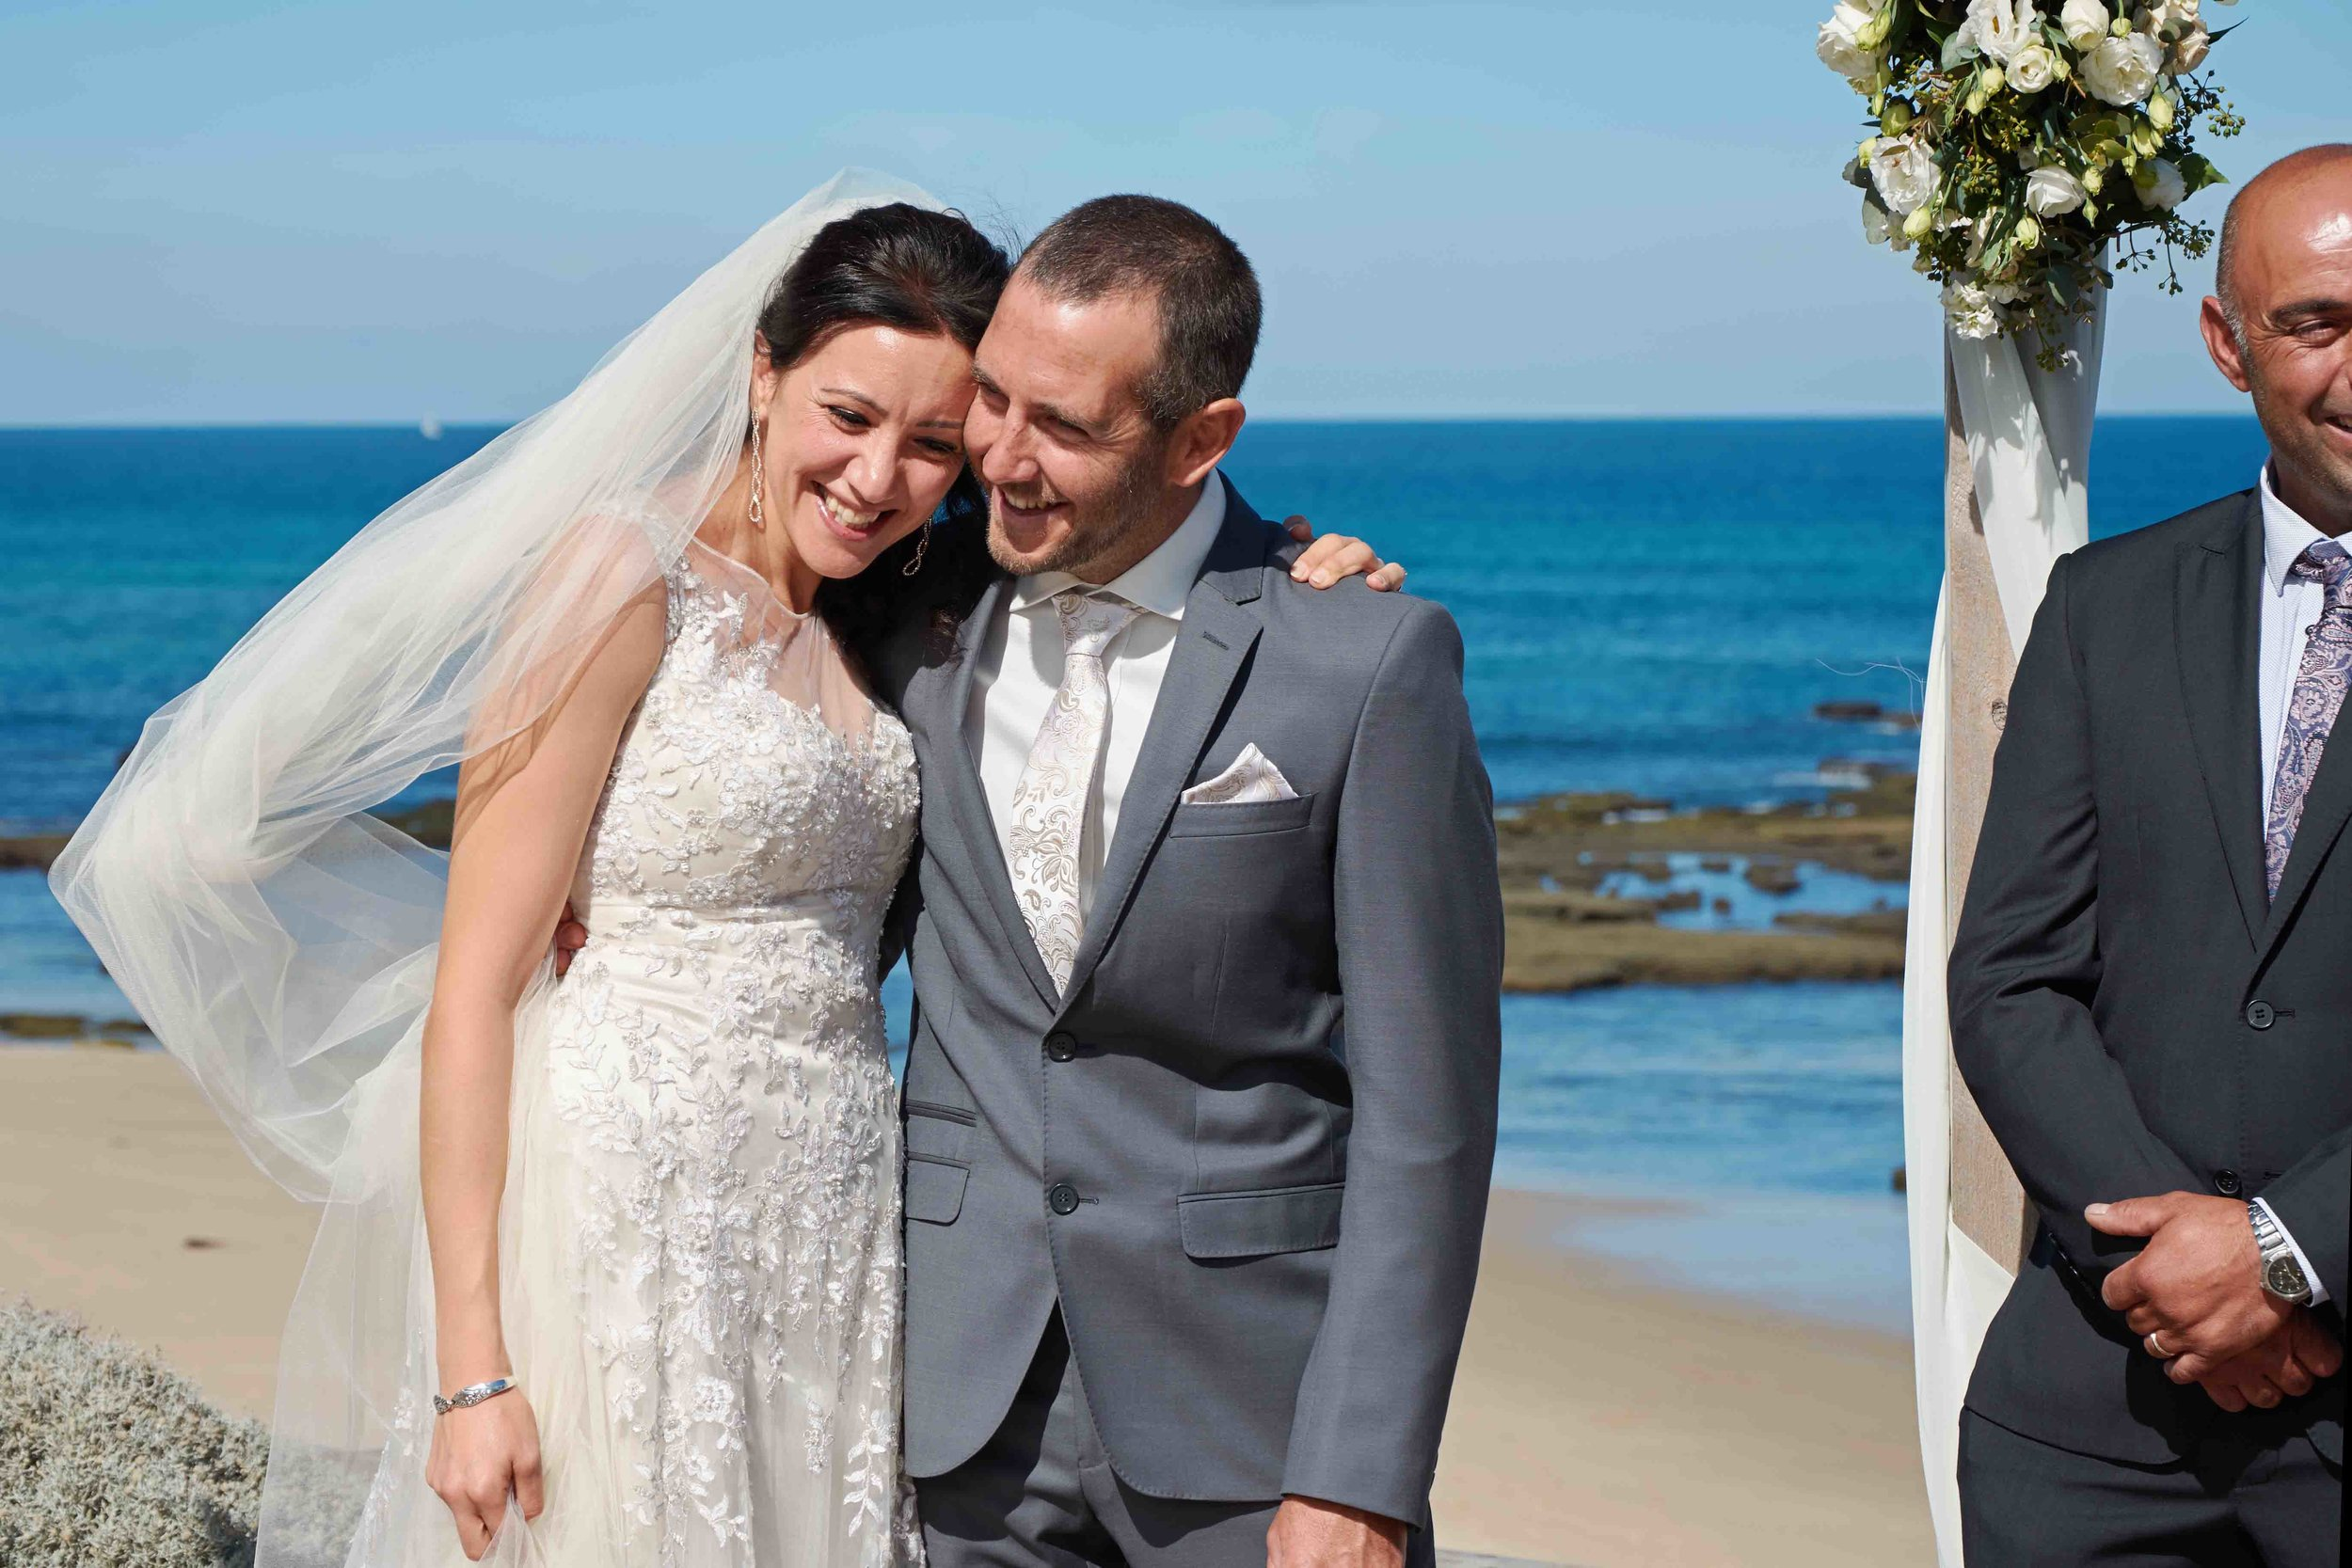 sorrento-wedding-photography-all-smiles-marissa-jade-photography-41.jpg